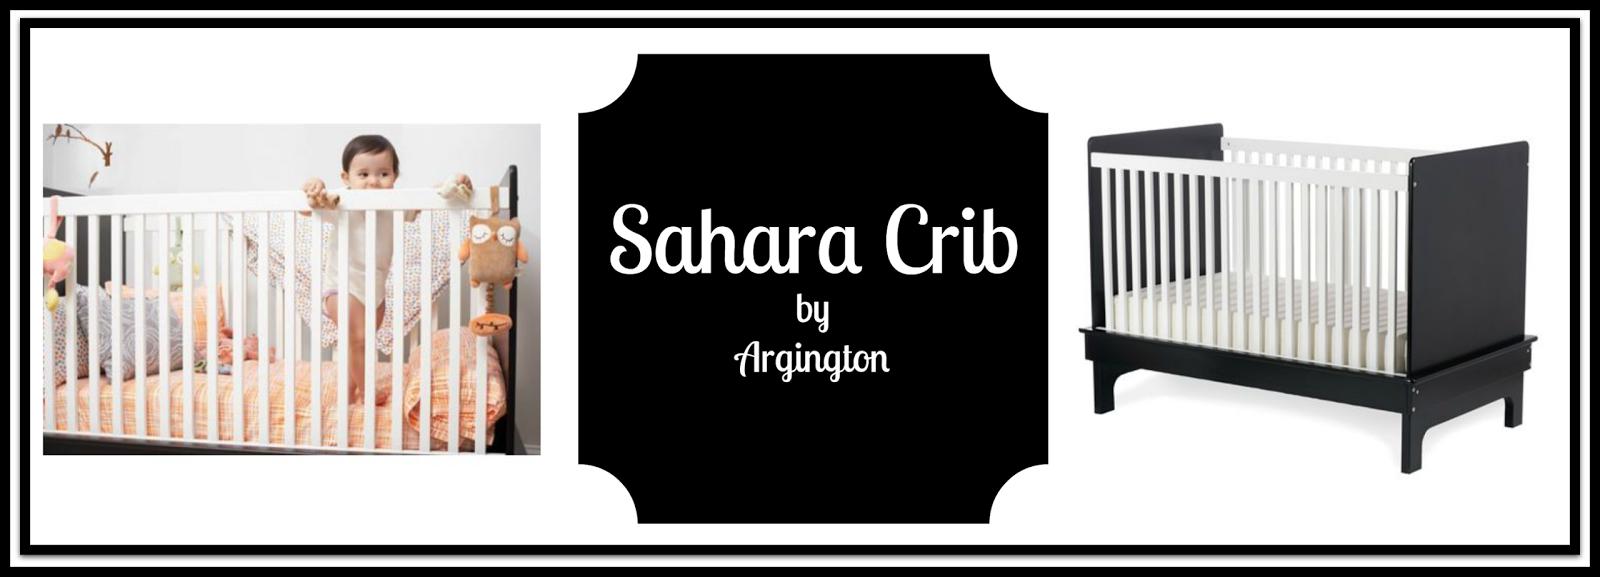 argington sahara crib conversion kit  creative ideas of baby cribs -  is a sleek modern crib at a great price the argington convertible crib